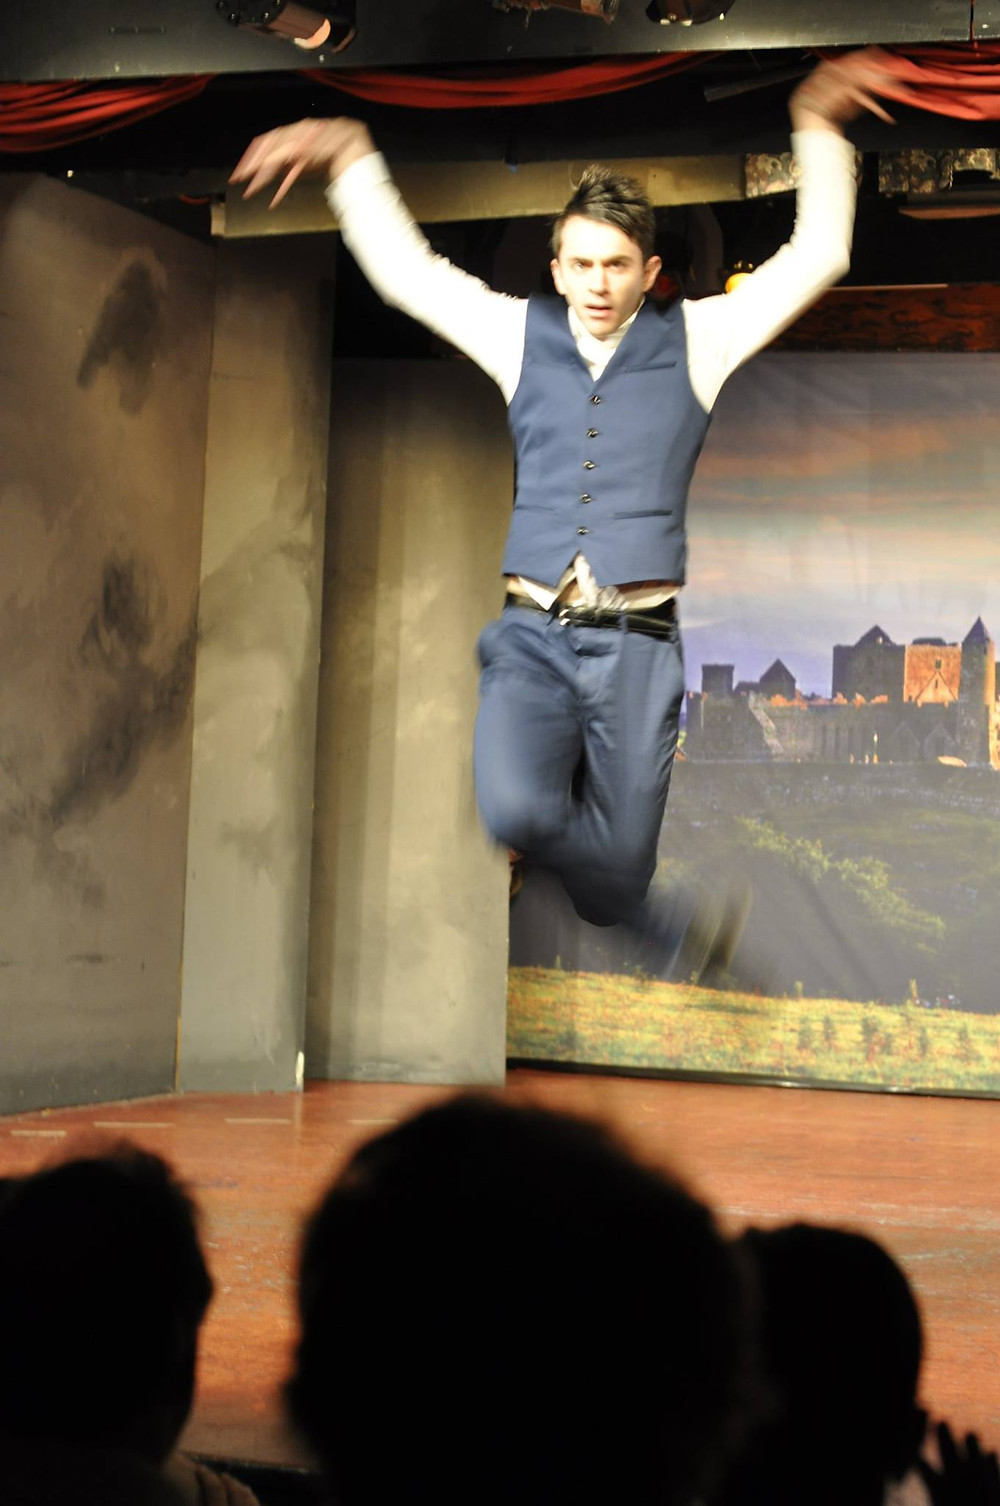 Mr Jonathon's crazy jump!